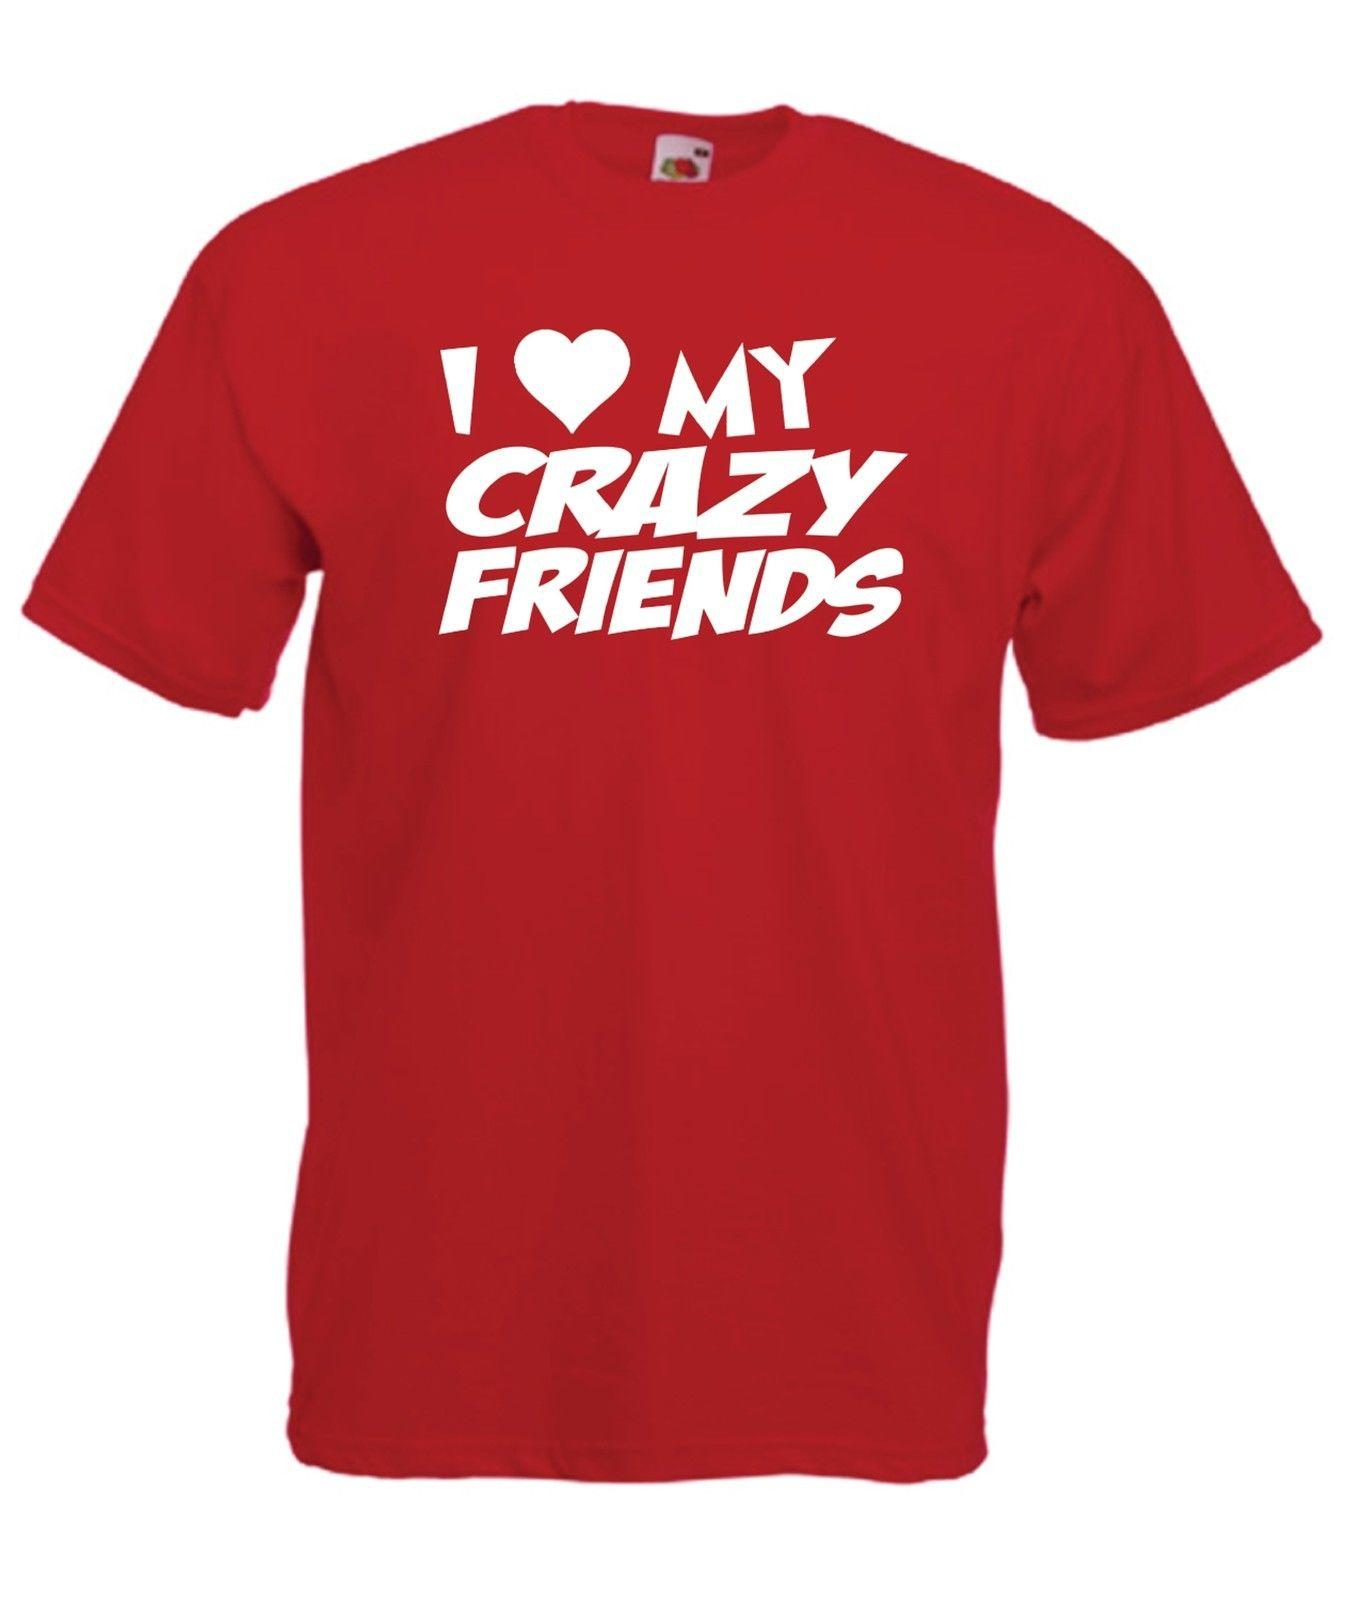 I LOVE MY CRAZY FRIENDS Top Funny Xmas Birthday Gift Ideas Mens Womens T SHIRT Buy Shirt Fun From Designtshirts201806 1066